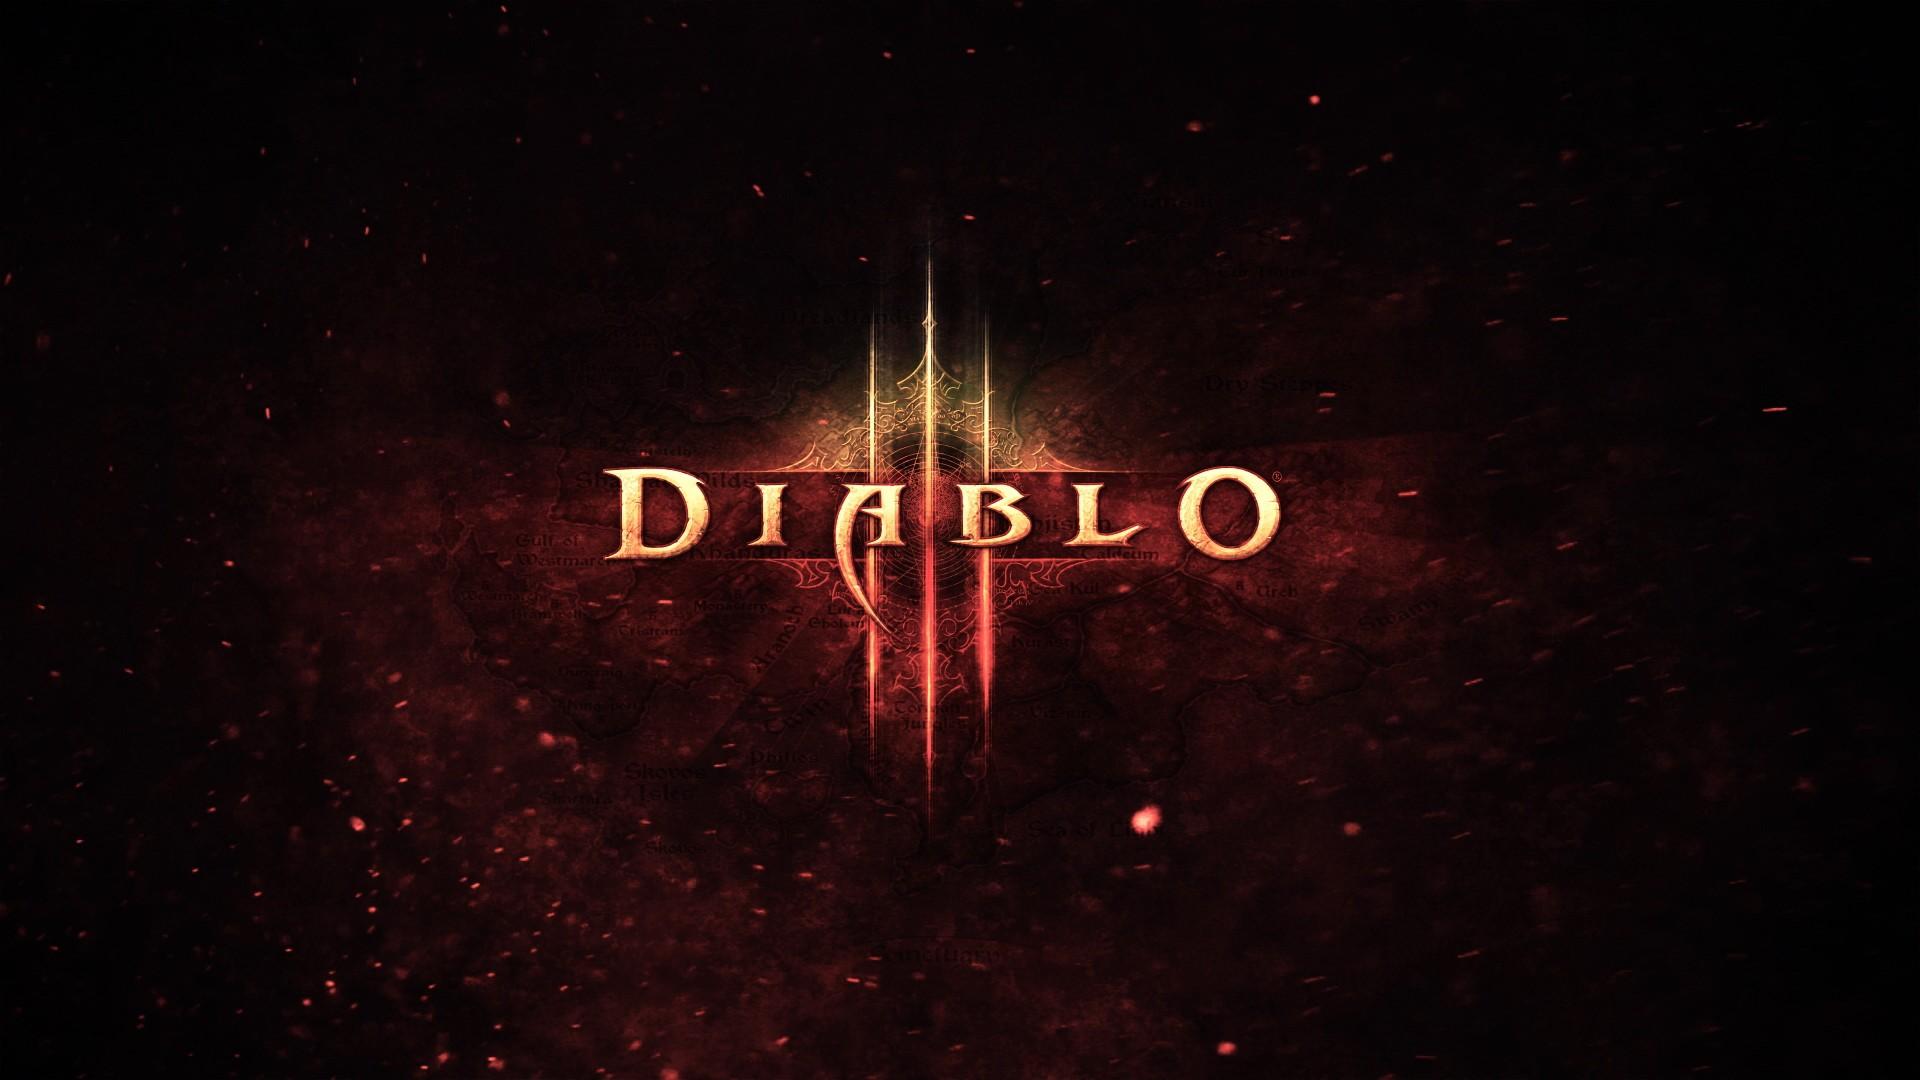 'Diablo 3': Blizzard Twitter teases a possible Switch port